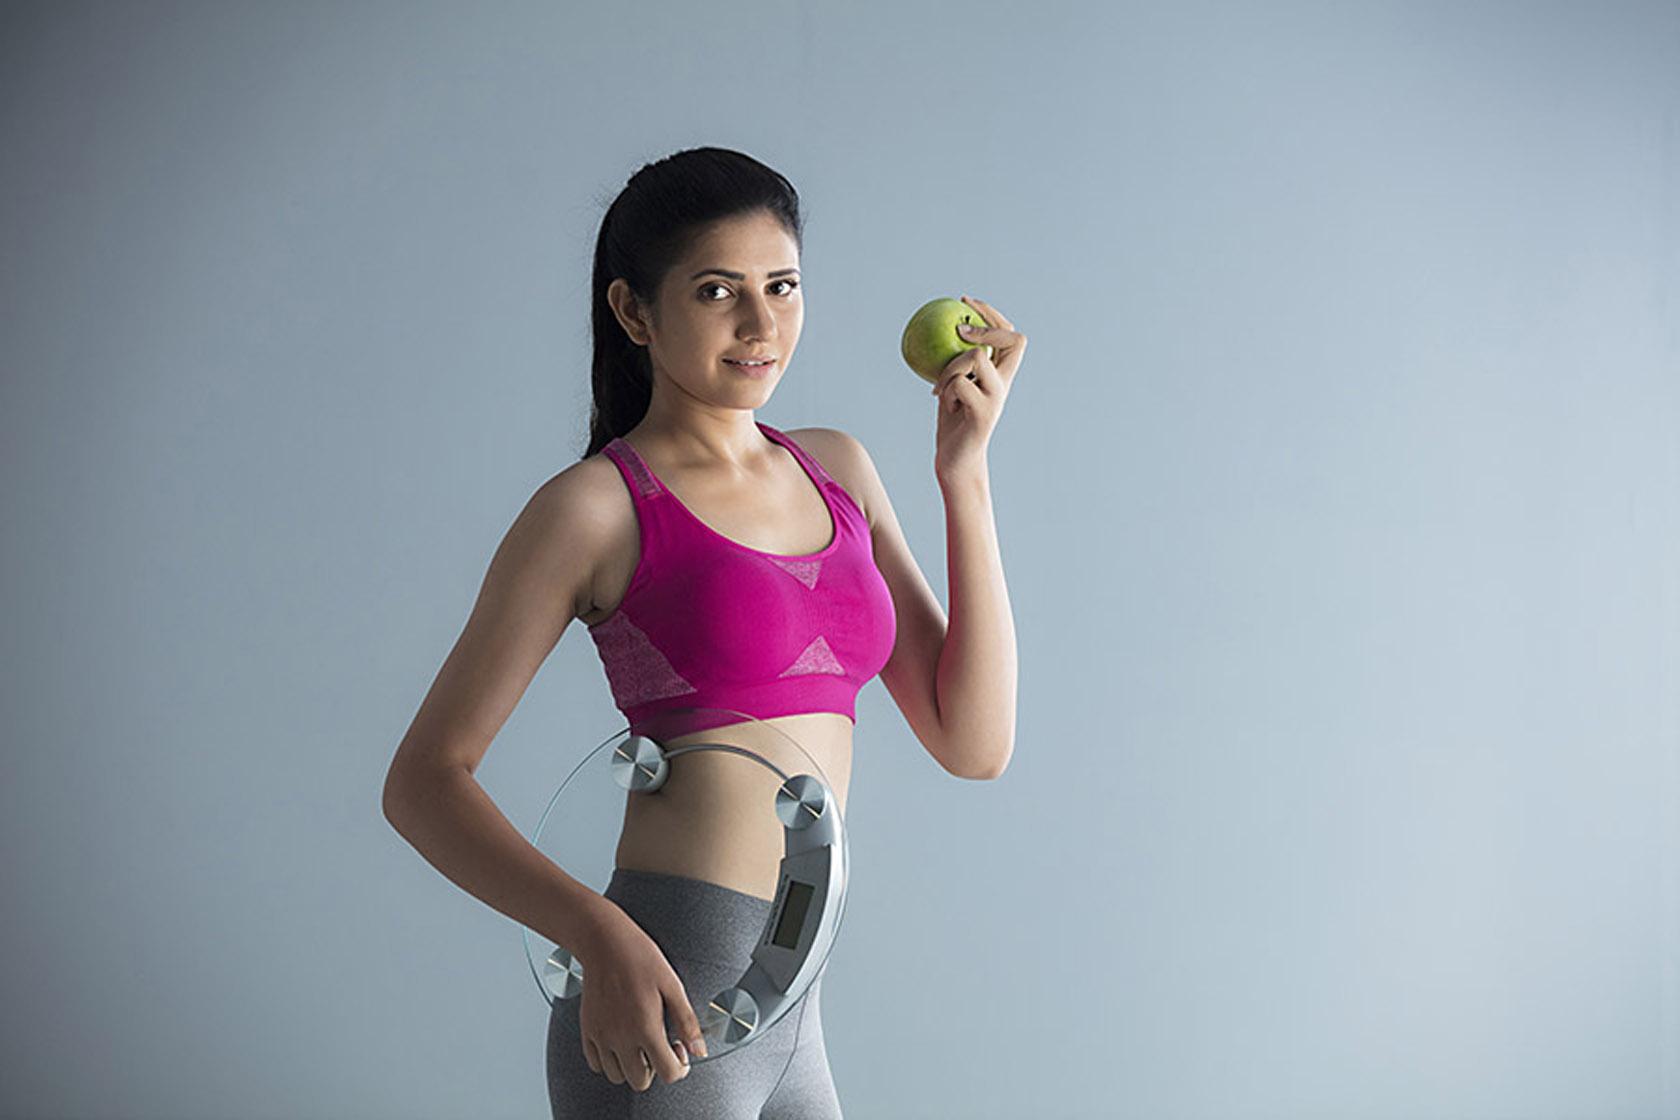 Keeping Healthy Habits